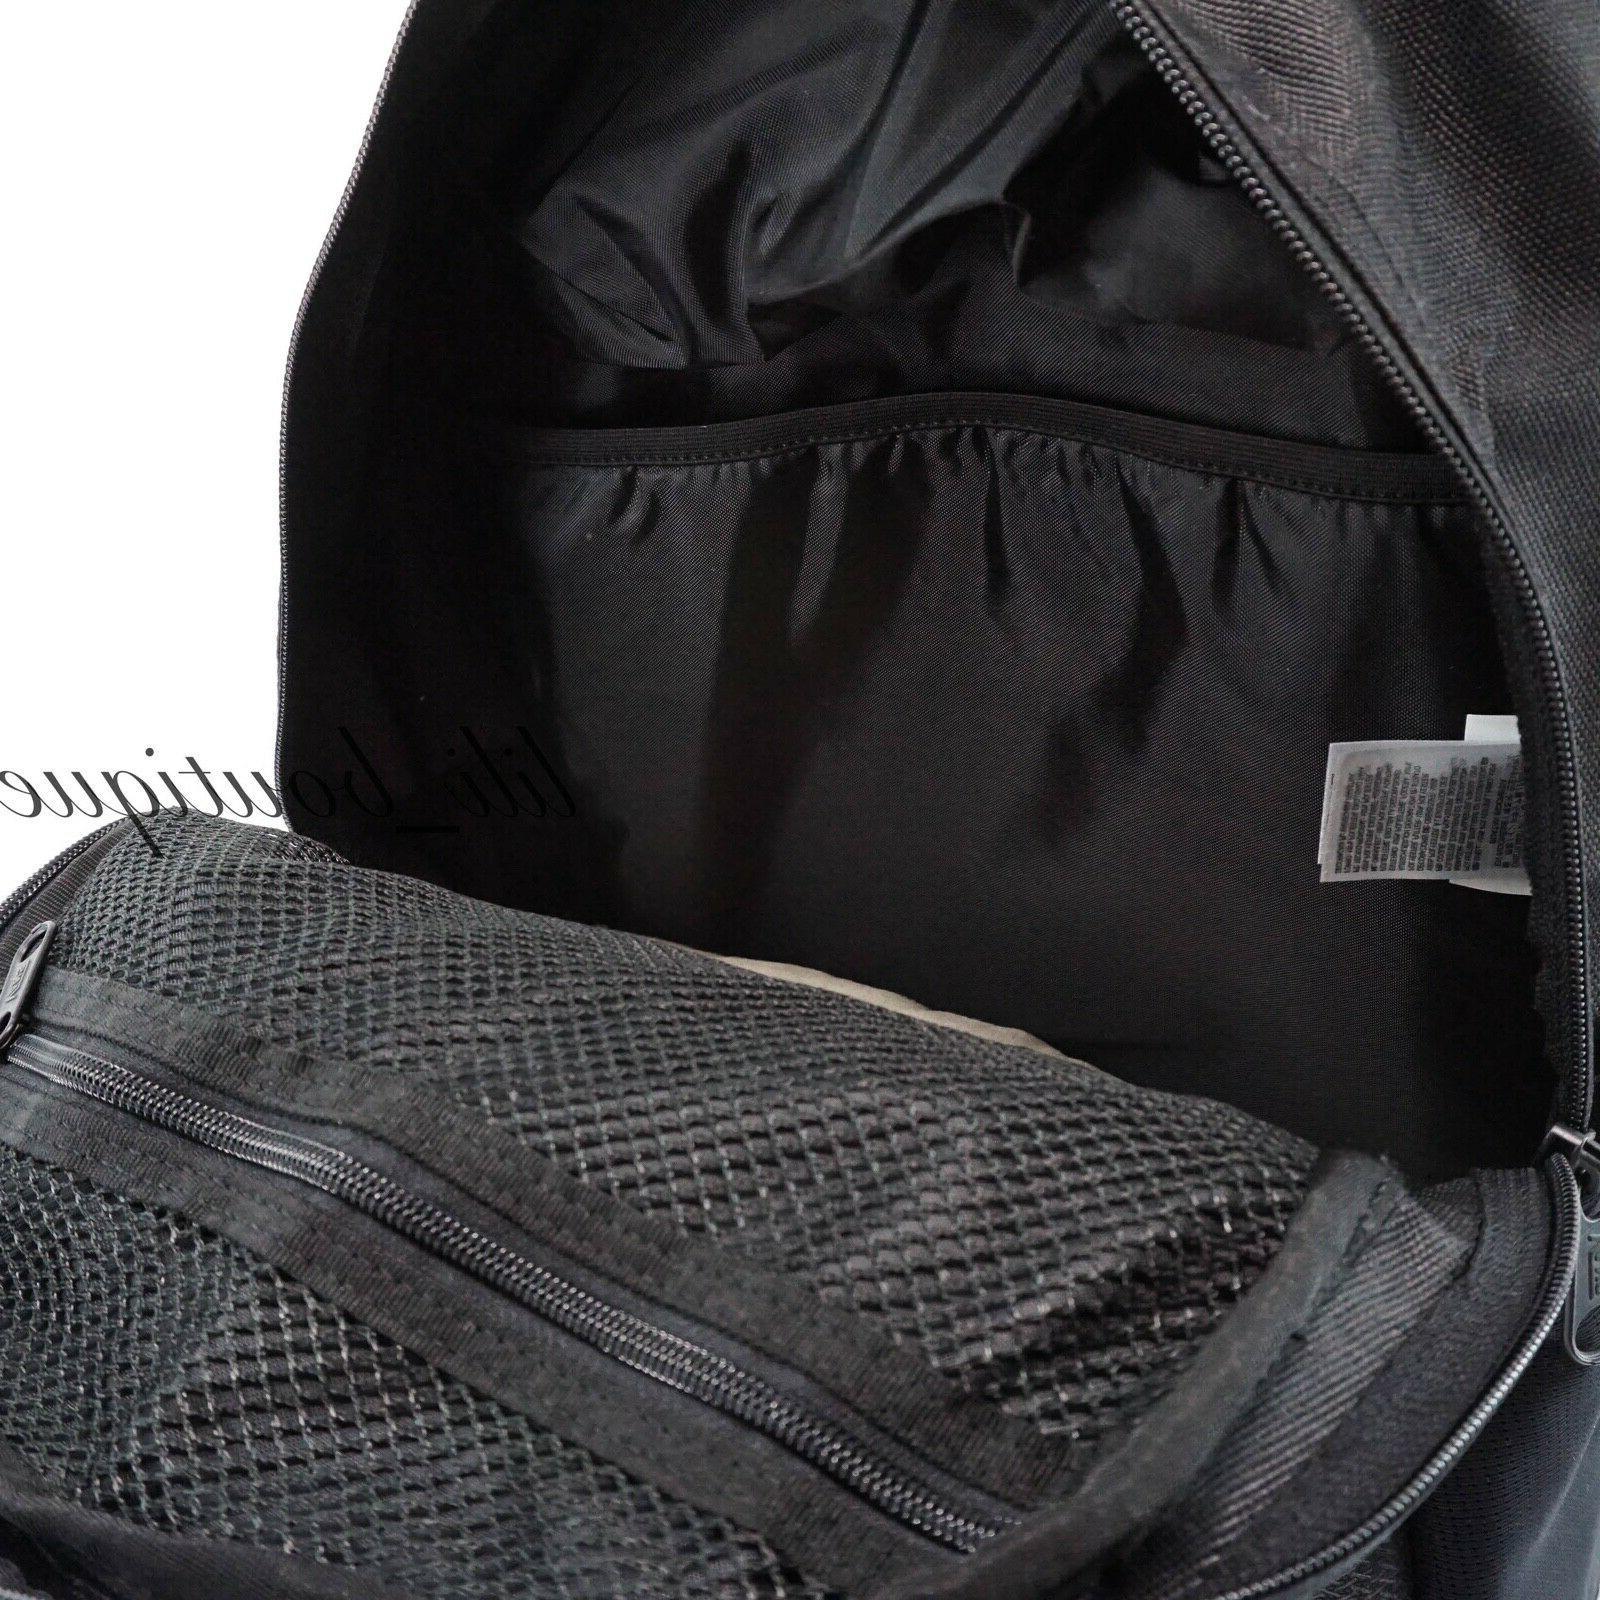 NWT Vans Skateboard Bag VN0A46NABLK